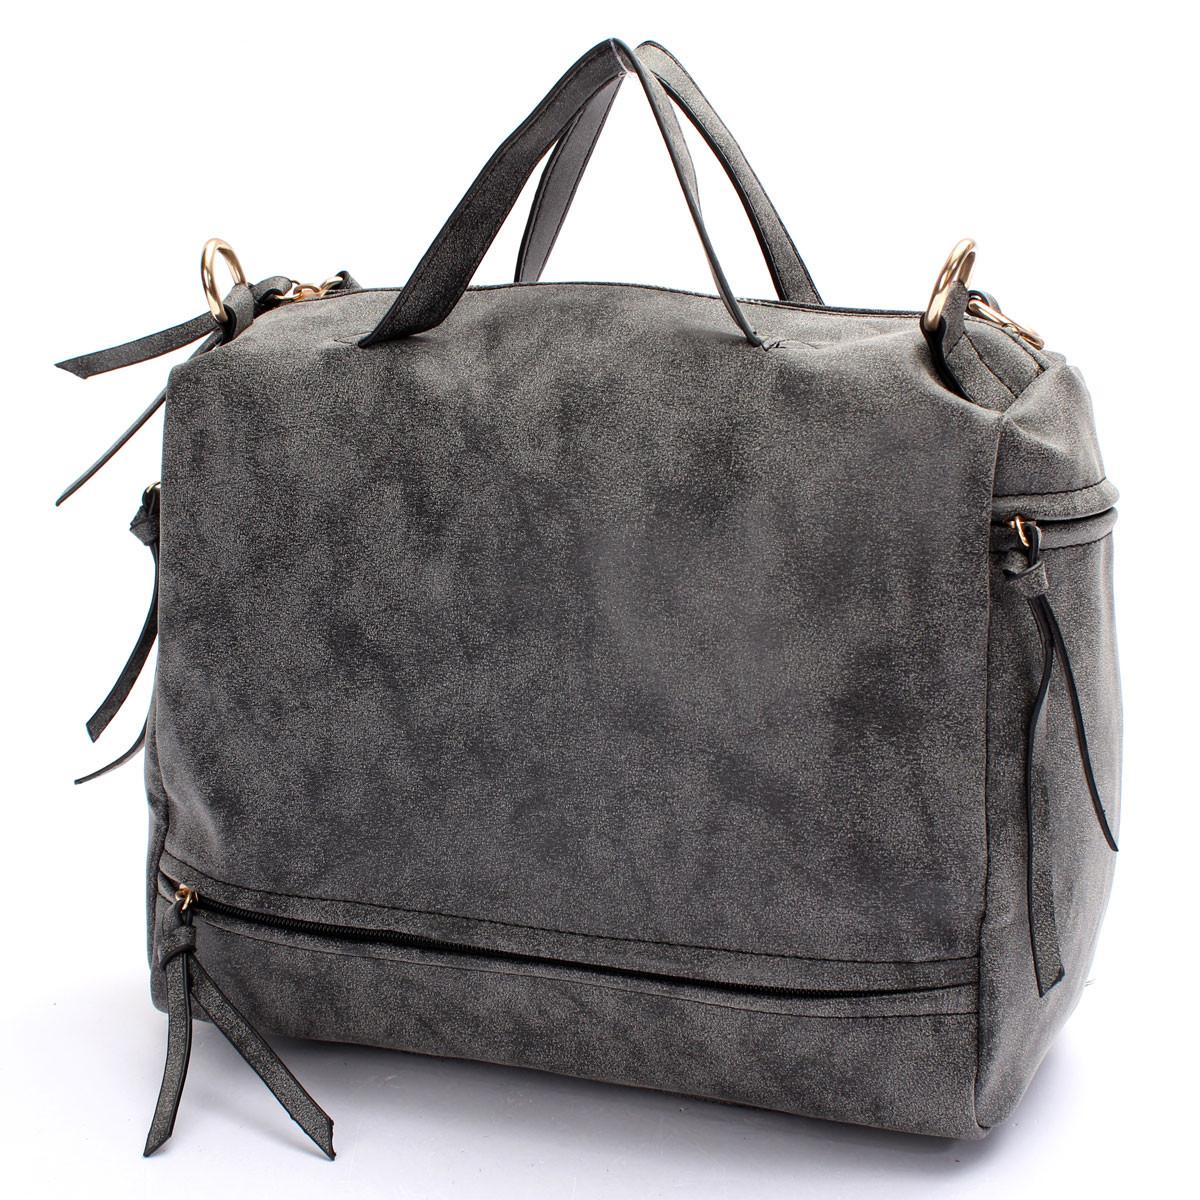 Women Lady Nubuck Leather Shoulder Bag Tote Handbag Messenger Crossbody Satchel